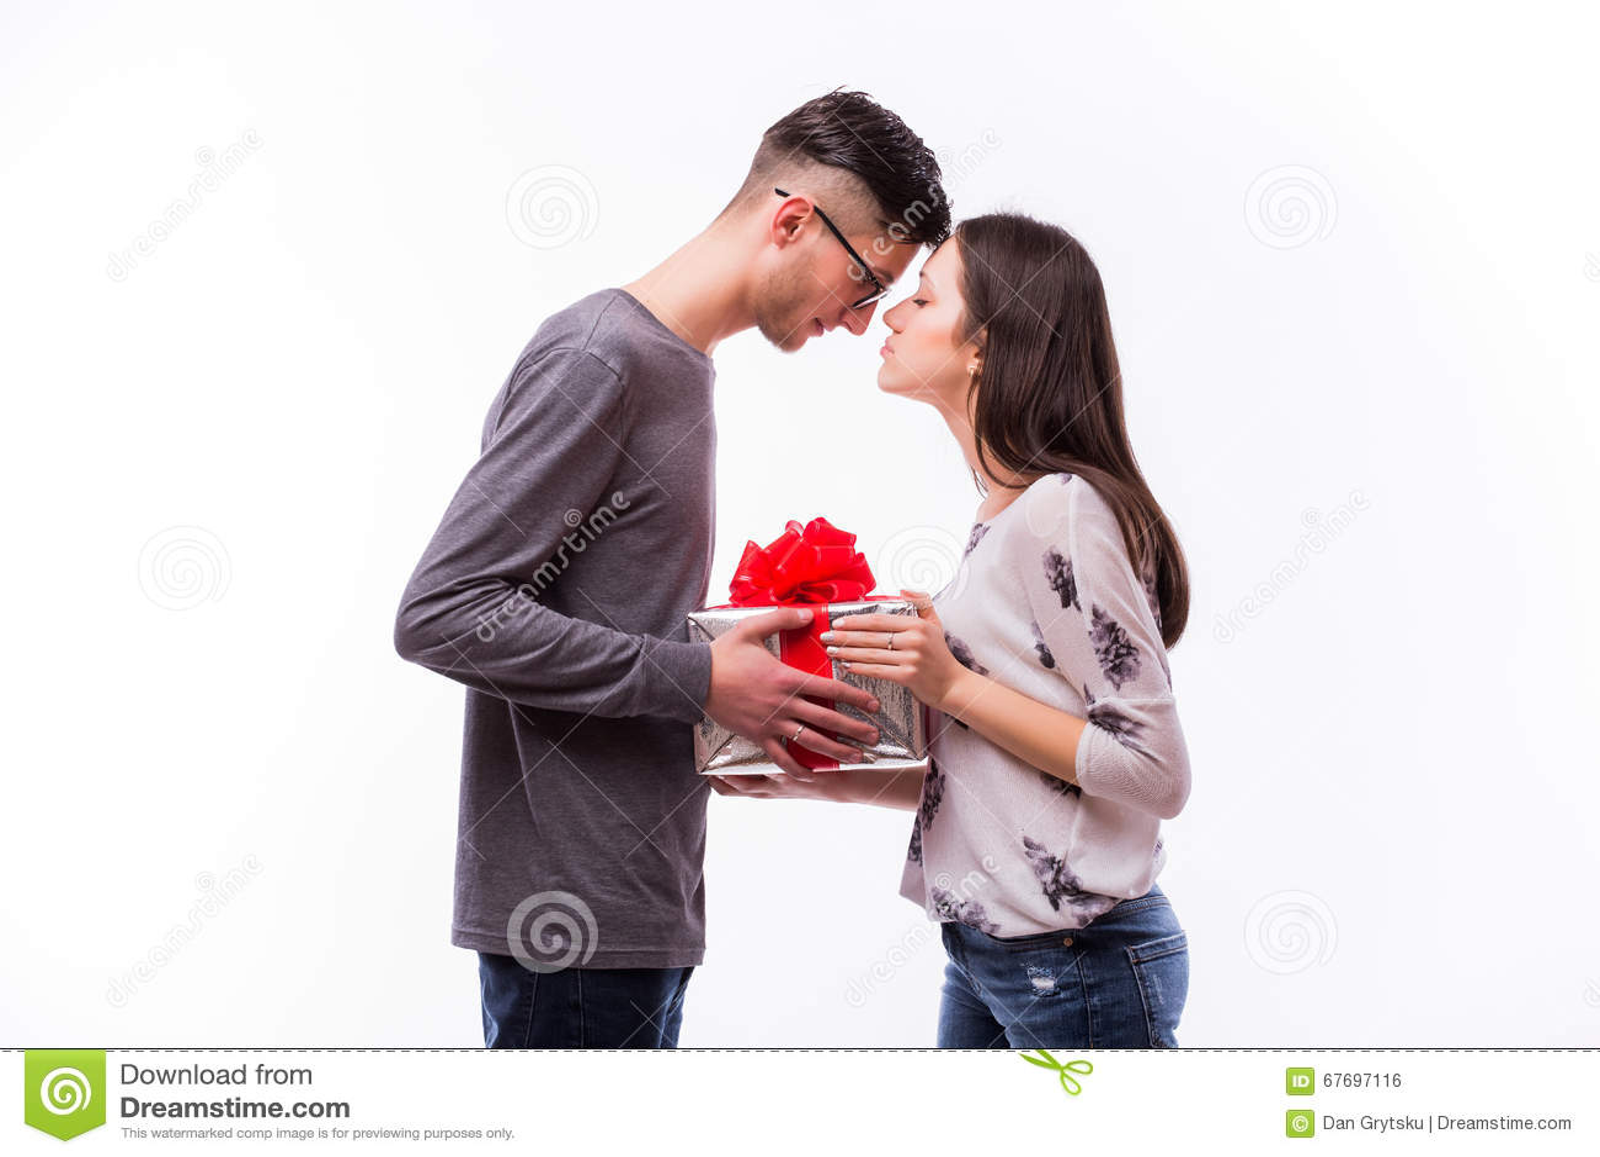 Ensamstående mamma online dating profil